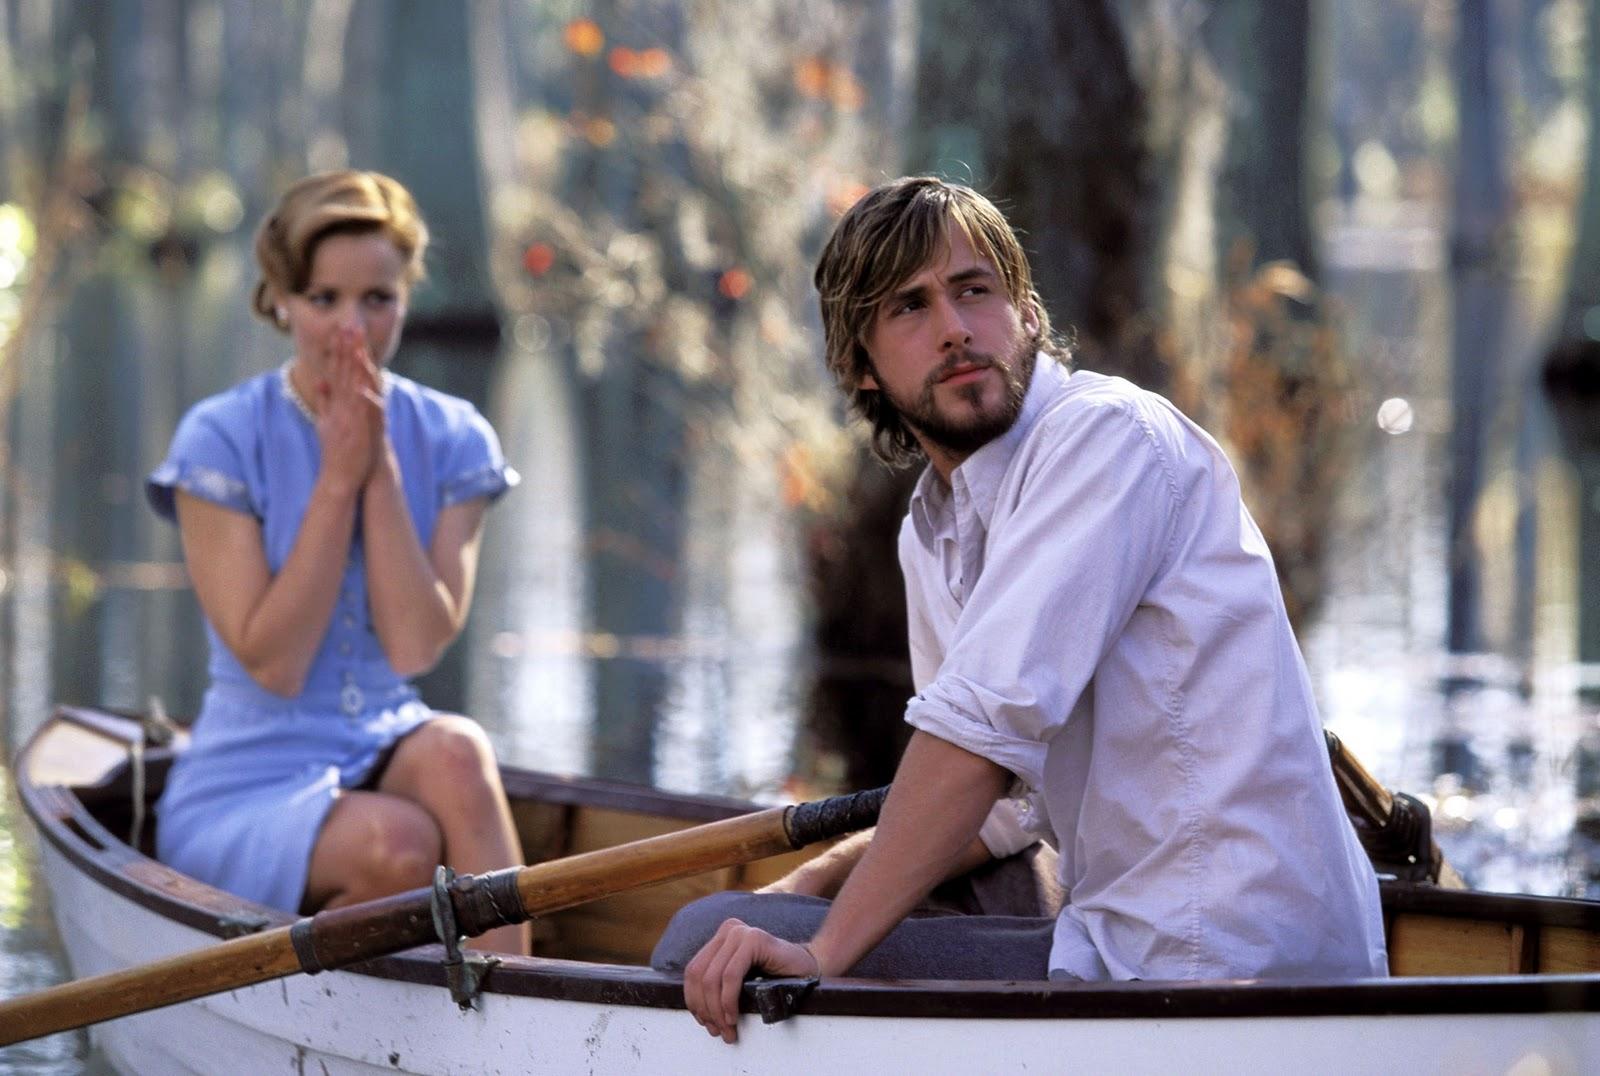 http://2.bp.blogspot.com/-vXZNXxV-VJc/TpuZboqeo3I/AAAAAAAAAa8/jCNUX5ZED2U/s1600/rachel-mcadams-dot-net_movies-thenotebook-stills-0008.jpg